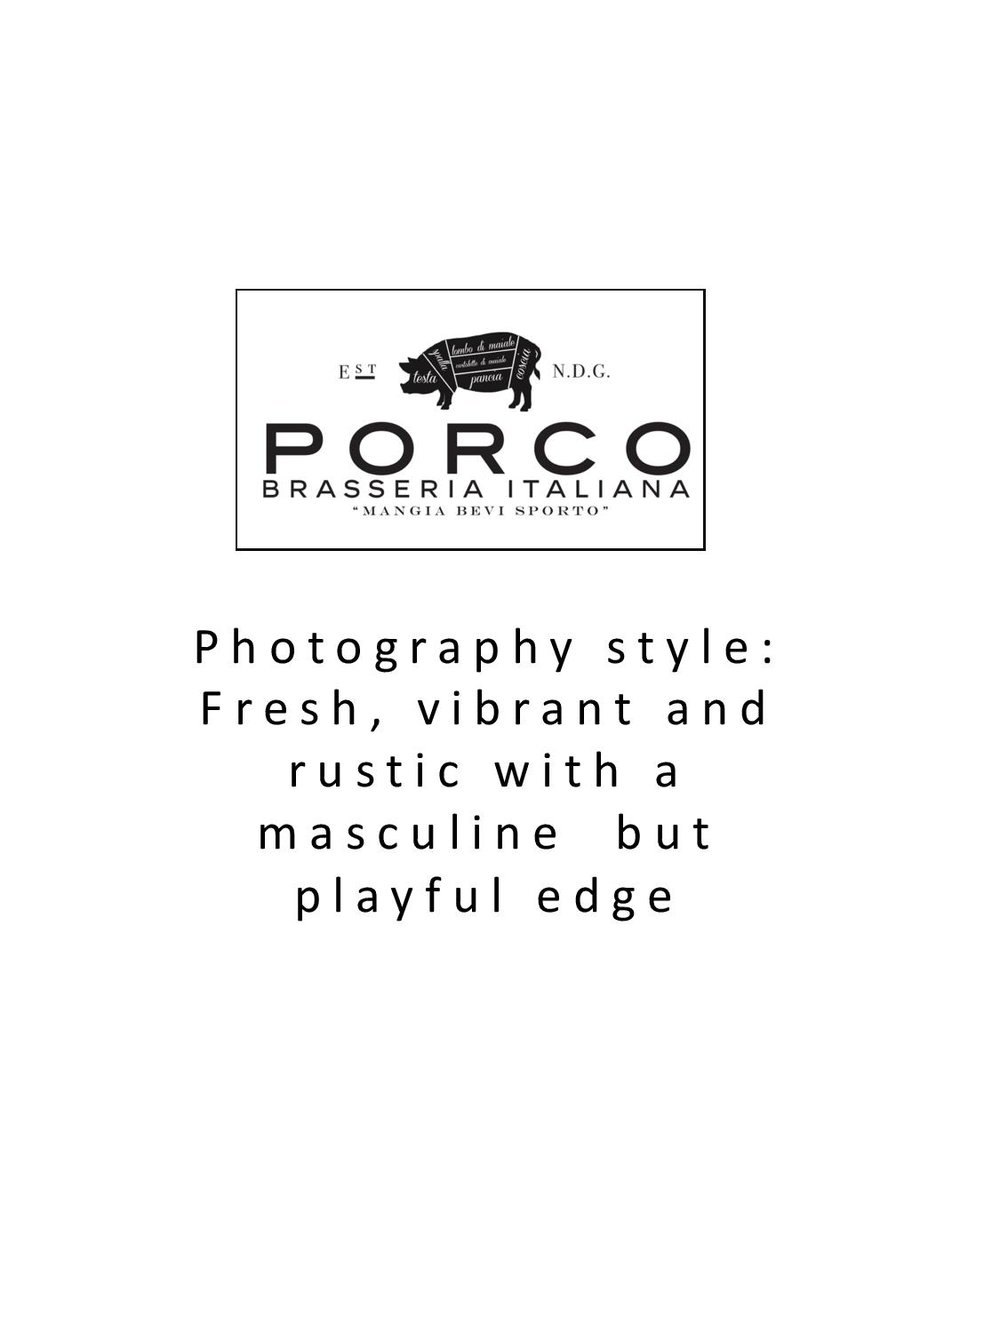 Porcos proposal-page-001.jpg